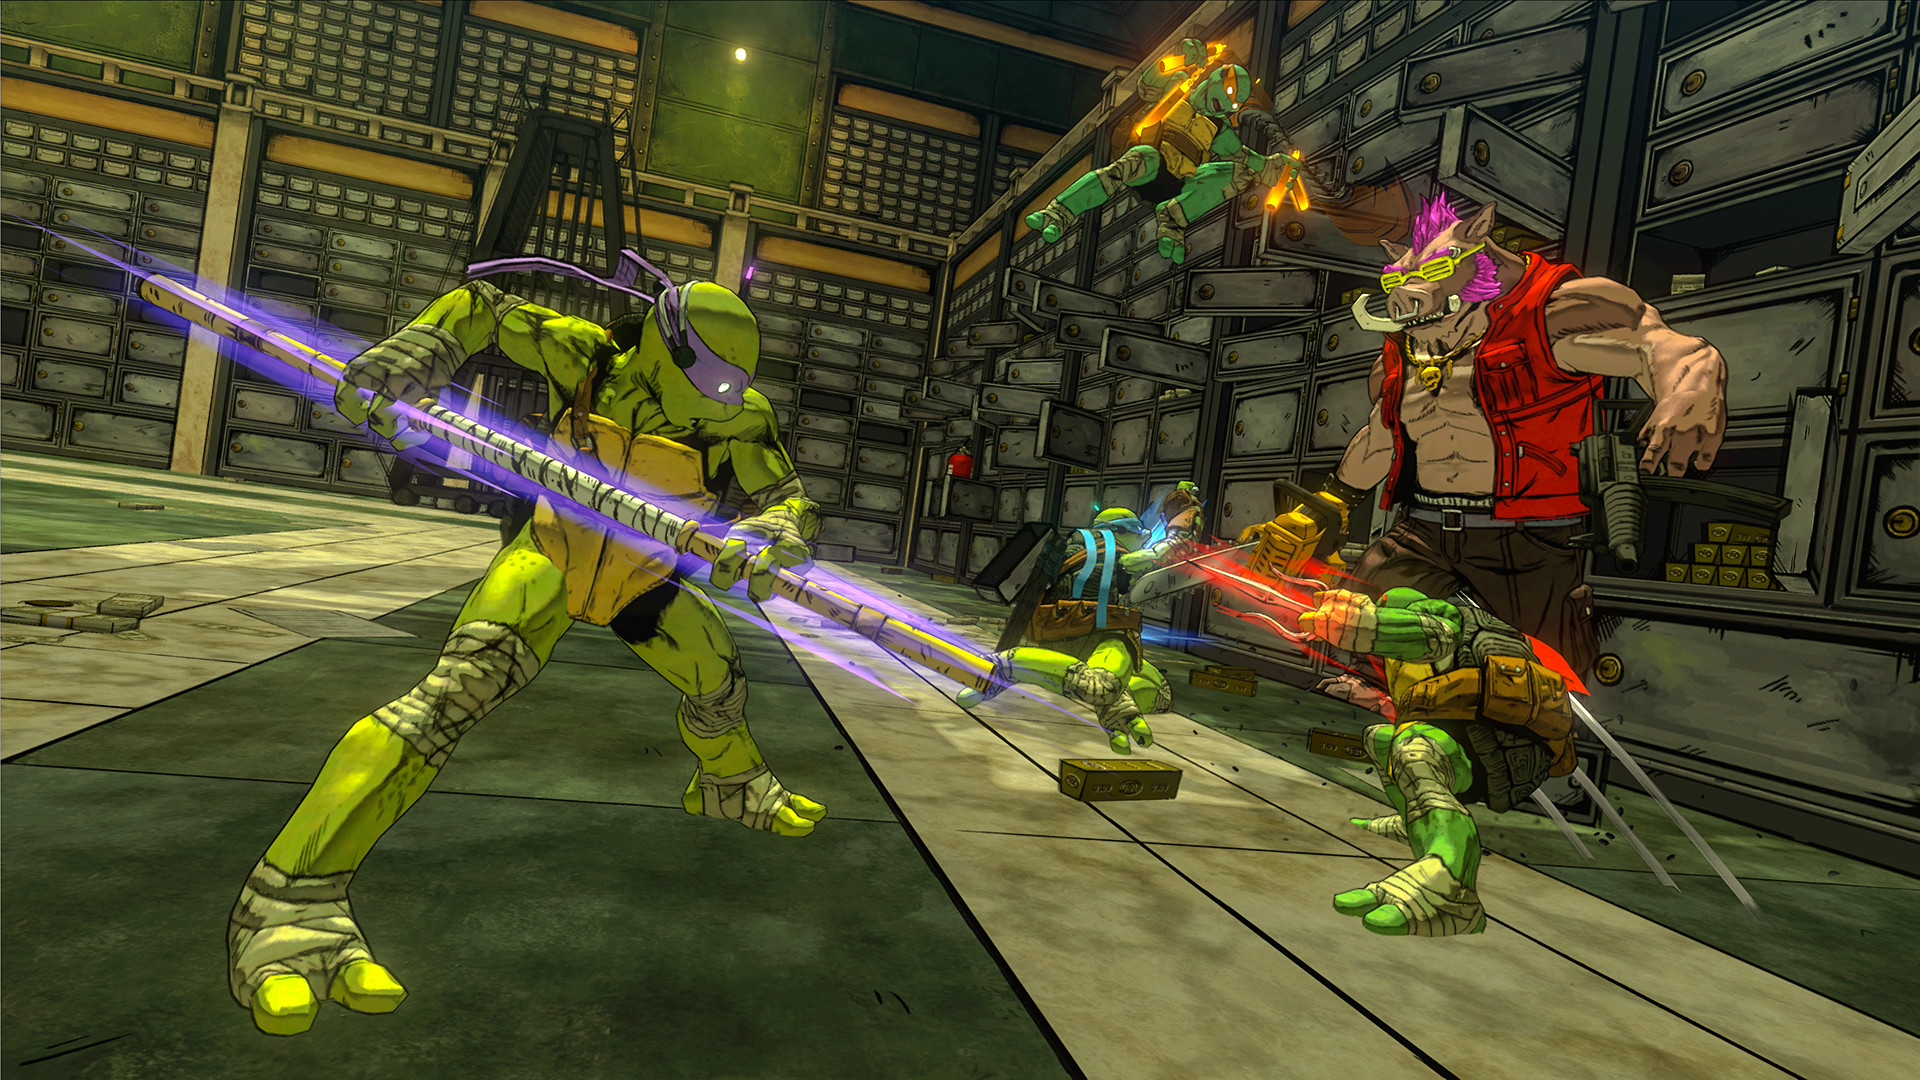 Teenage Mutant Ninja Turtles: Mutants in Manhattan Screenshot 1